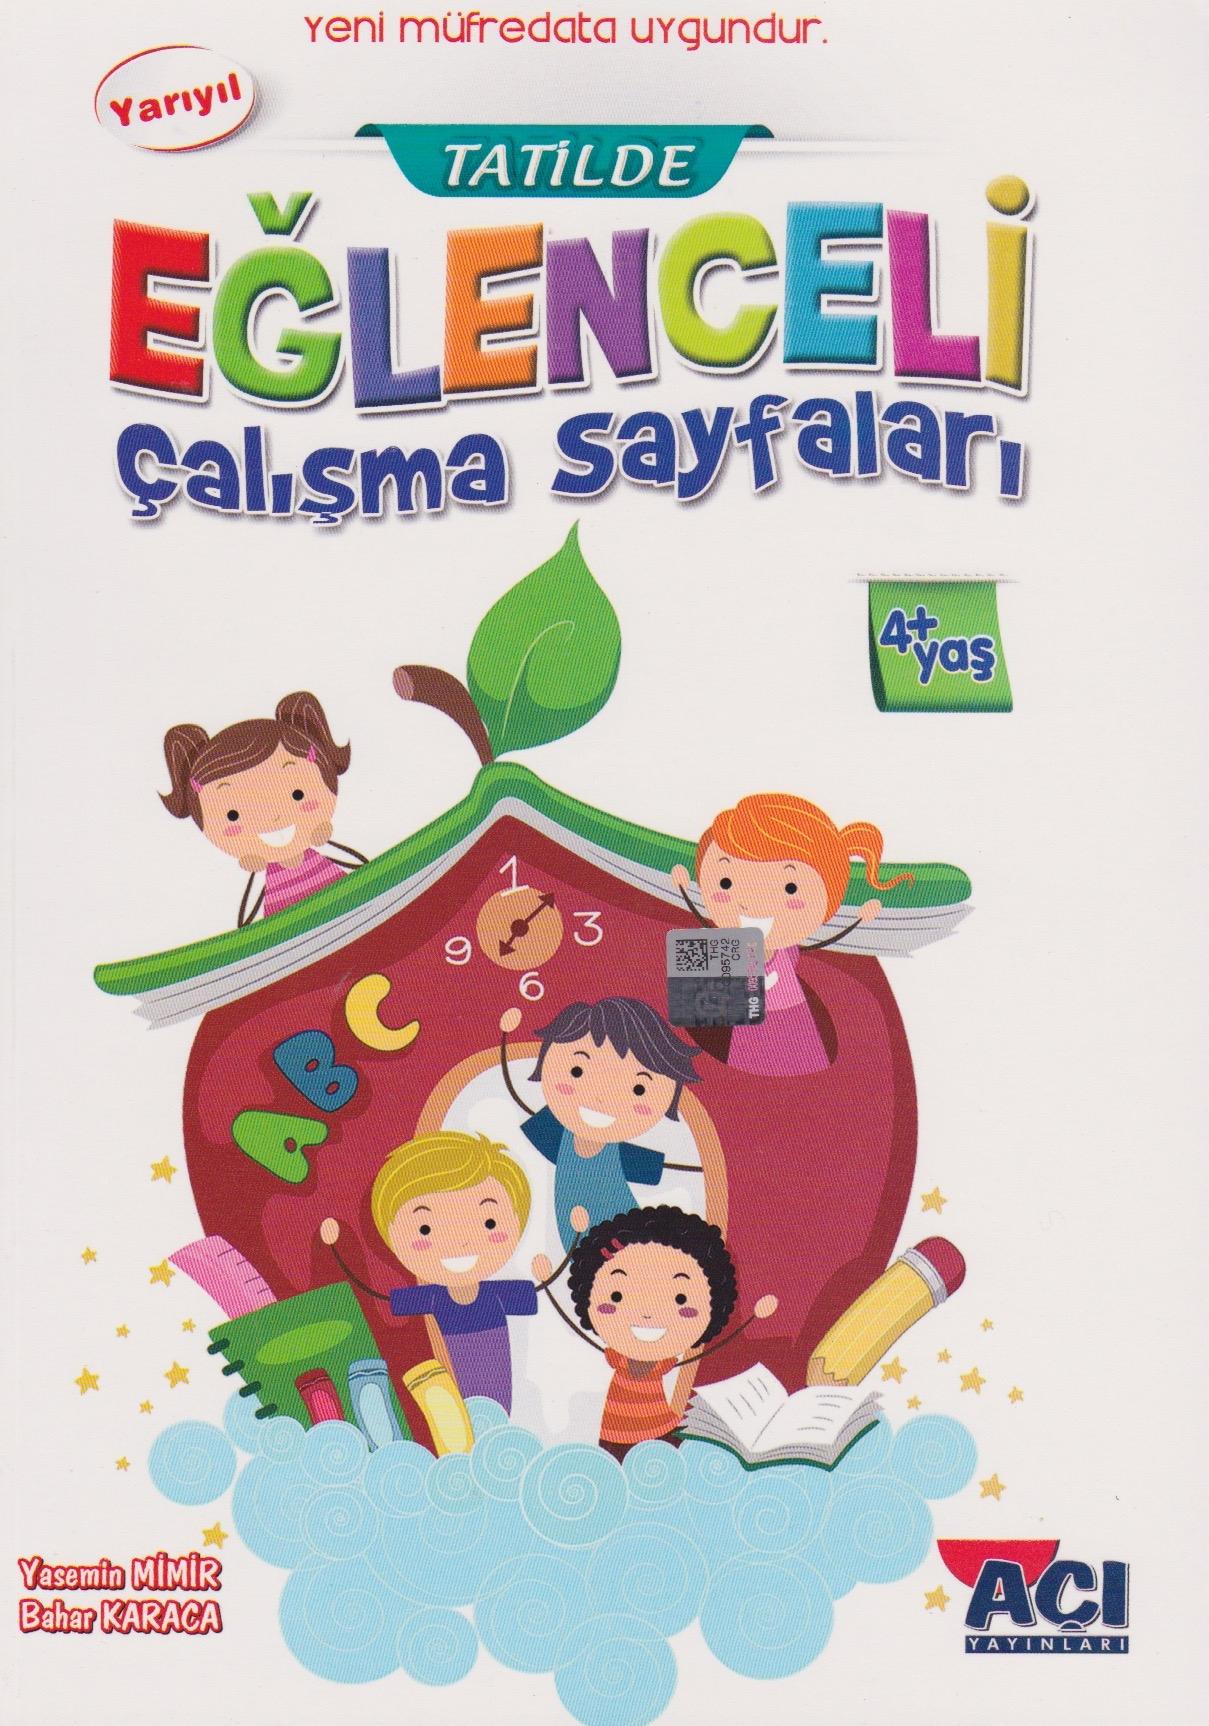 Aci Yayincilik Okul Oncesi Tatil Calisma Sayfalari 4yas